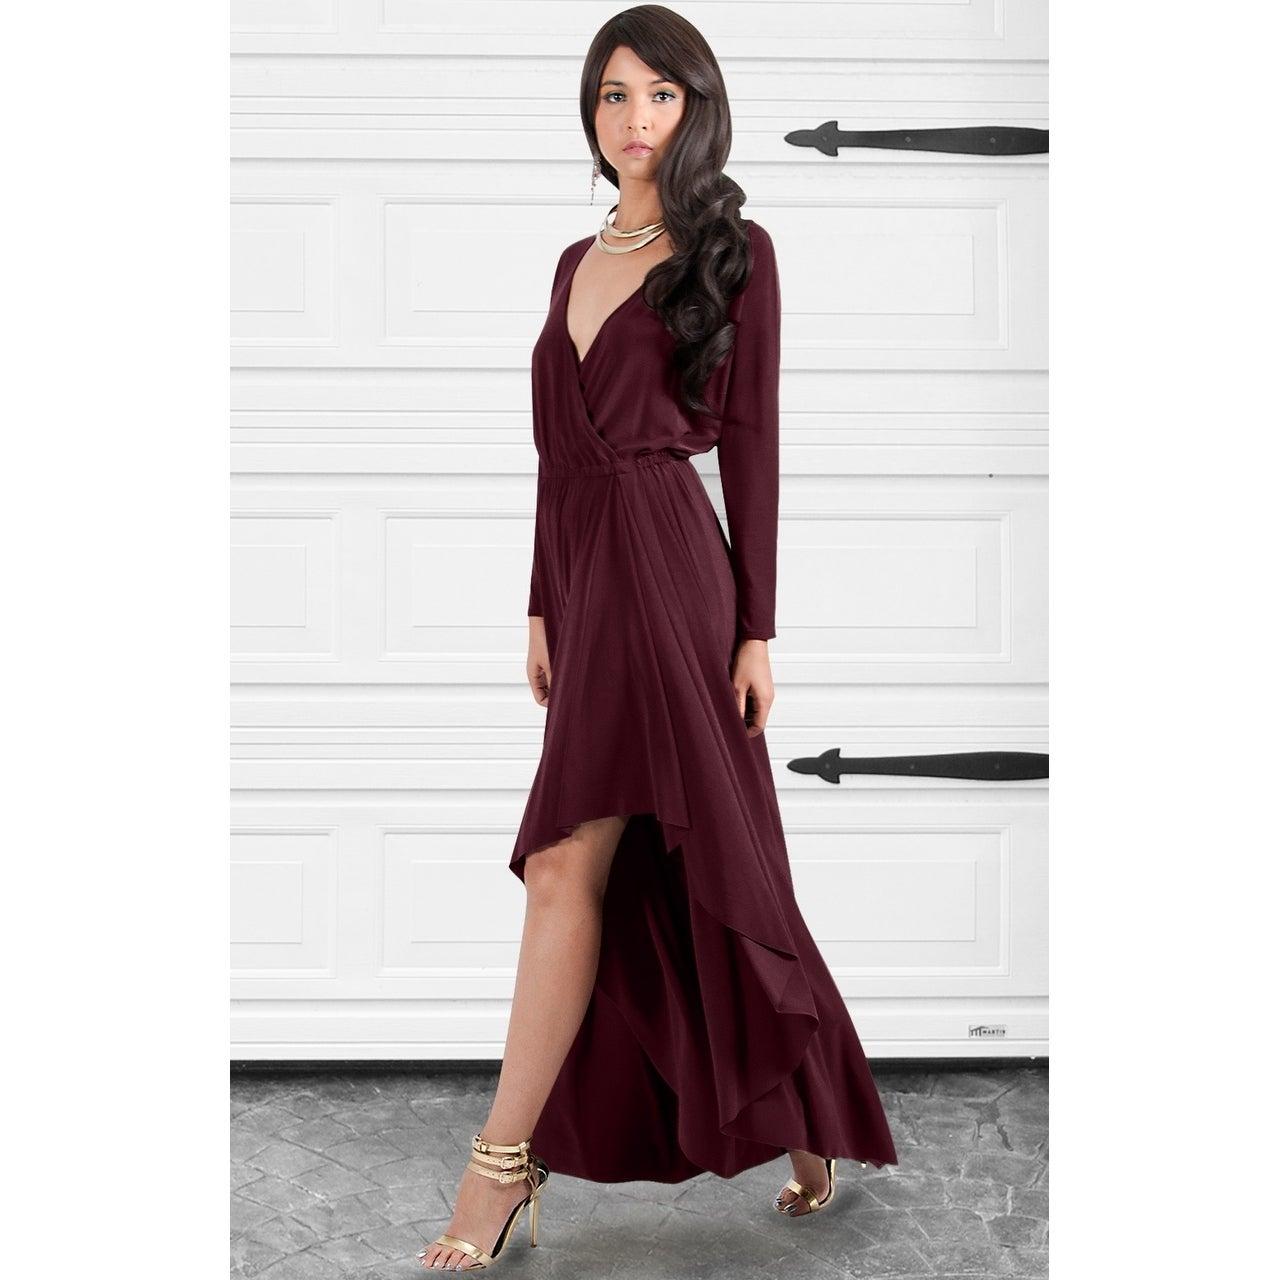 f68da3a4ee6a Shop KOH KOH Womens Designer Long Sleeve Drape Split Cocktail Maxi Dress -  Free Shipping Today - Overstock - 10910394